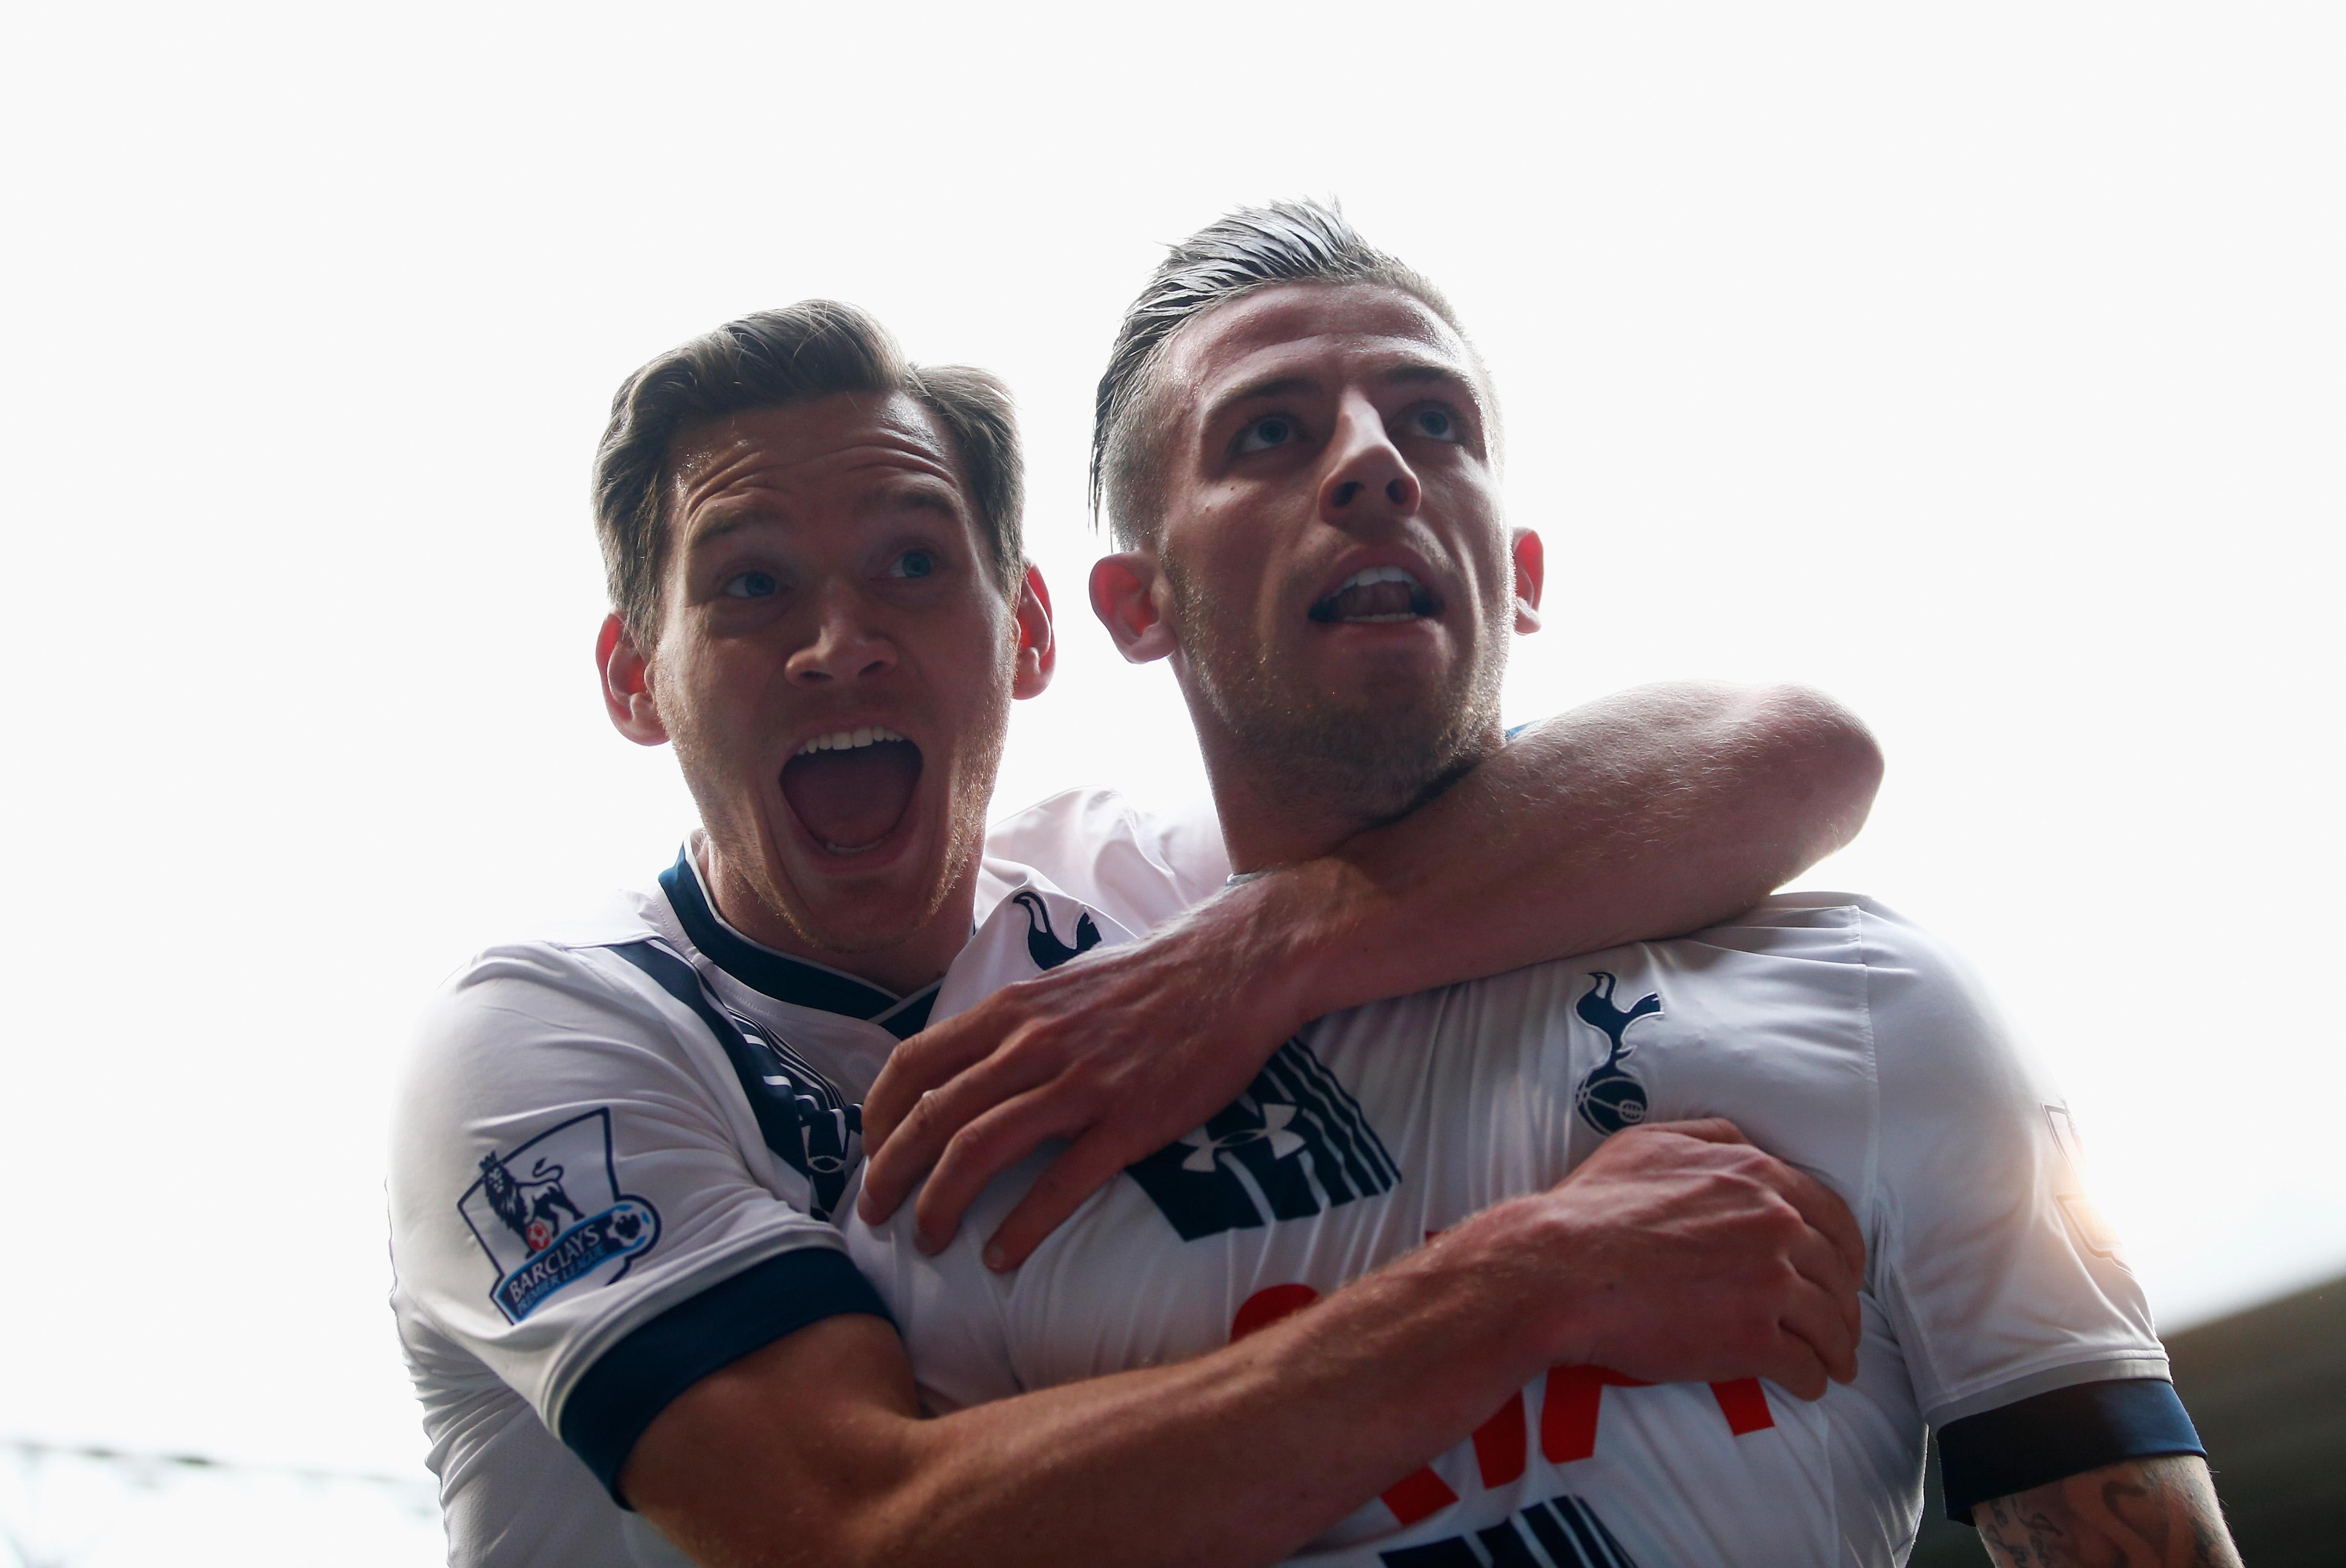 Tottenham star Toby Alderweireld has £25 million release clause